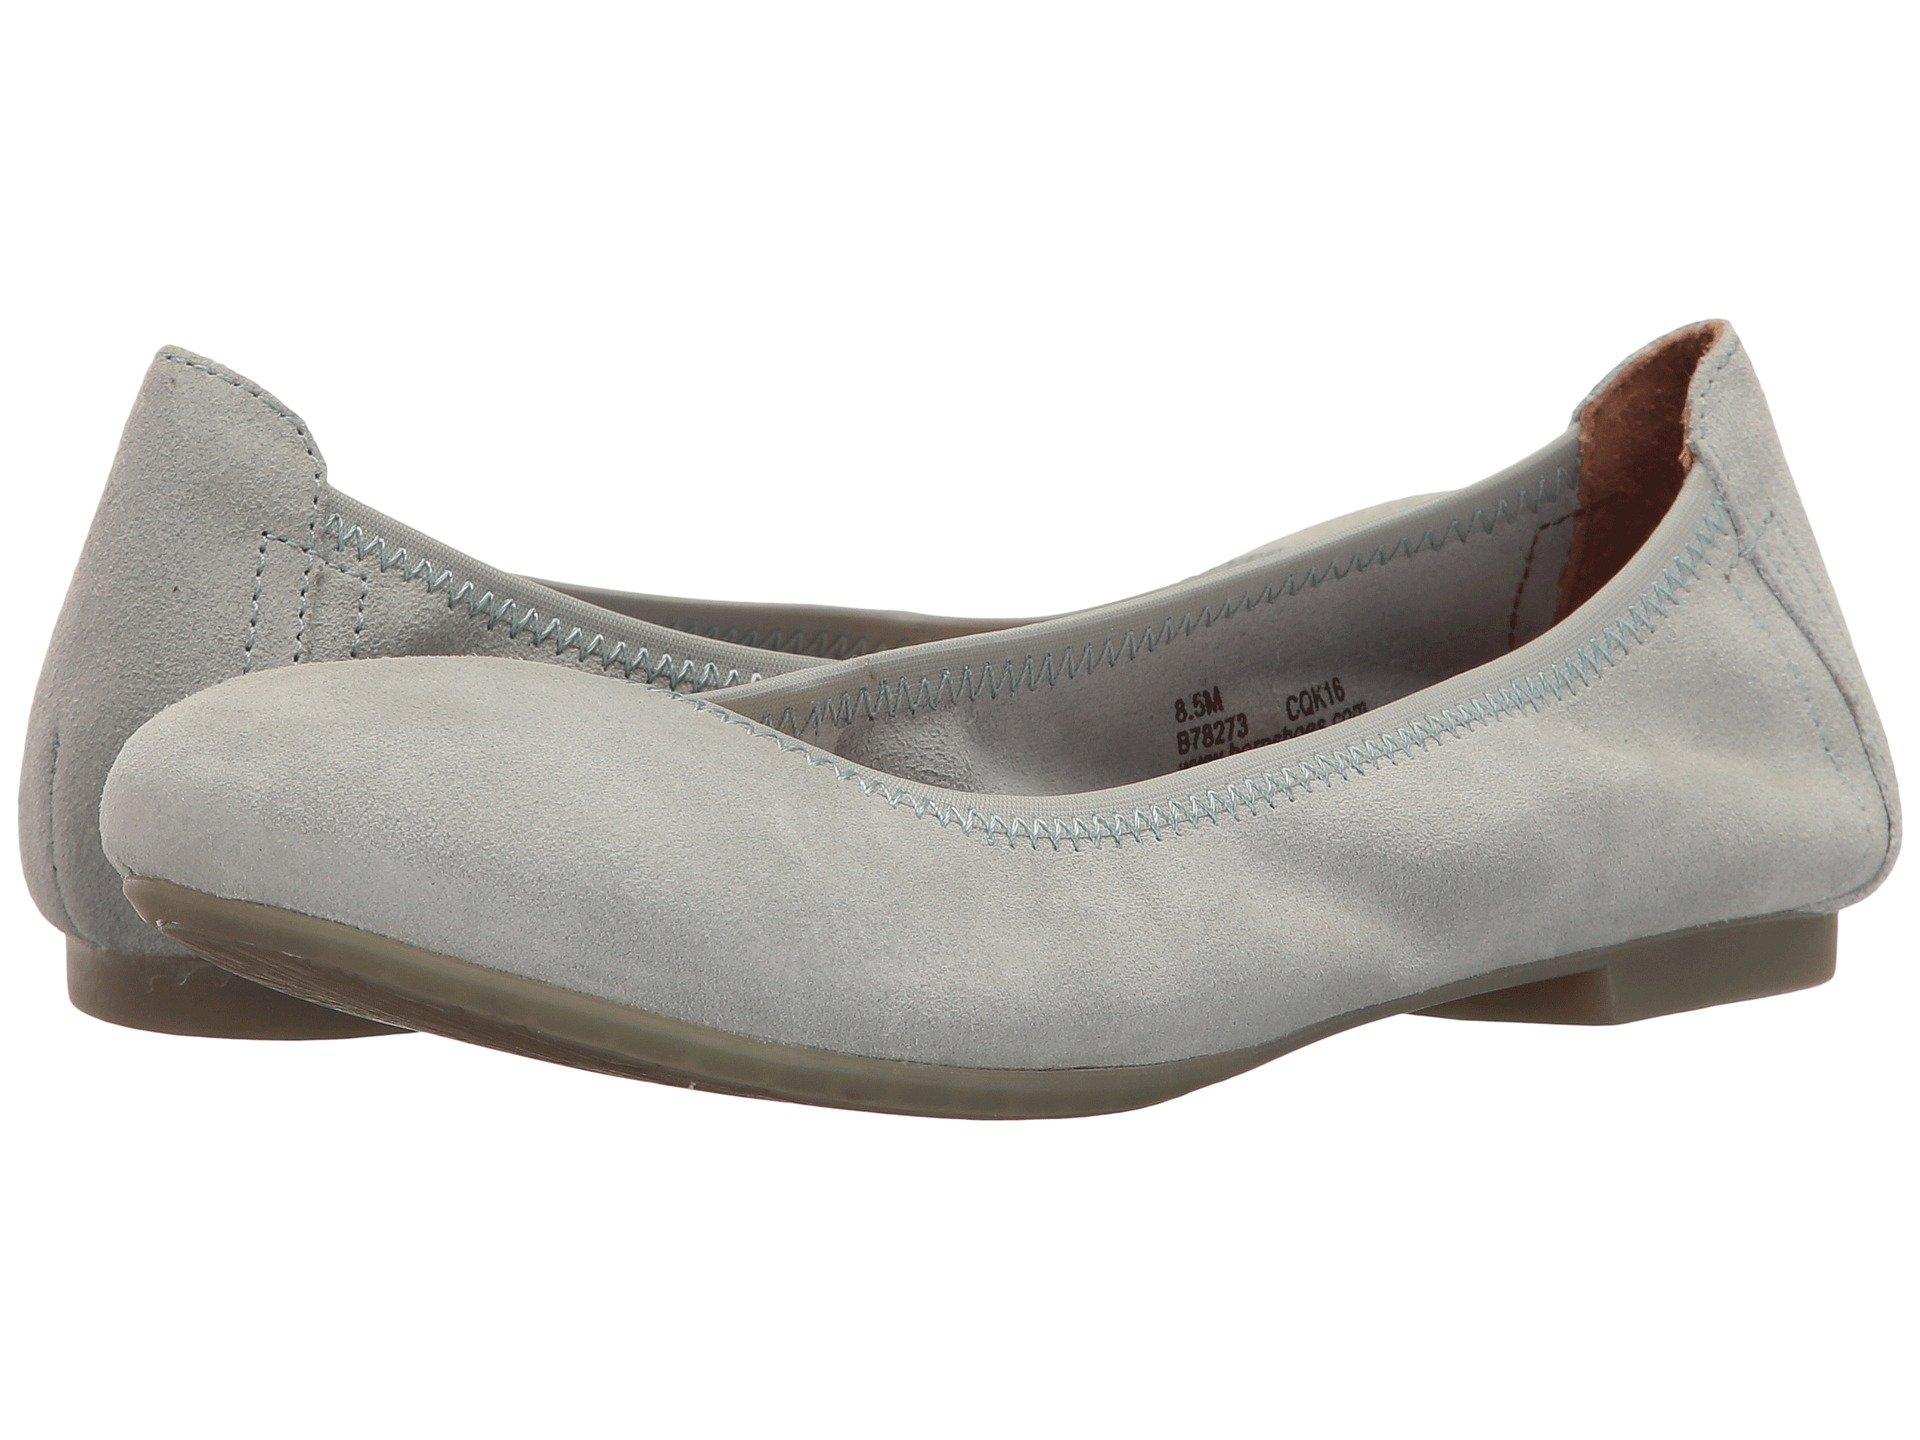 Baletas para Mujer Born Julianne  + Born en VeoyCompro.net